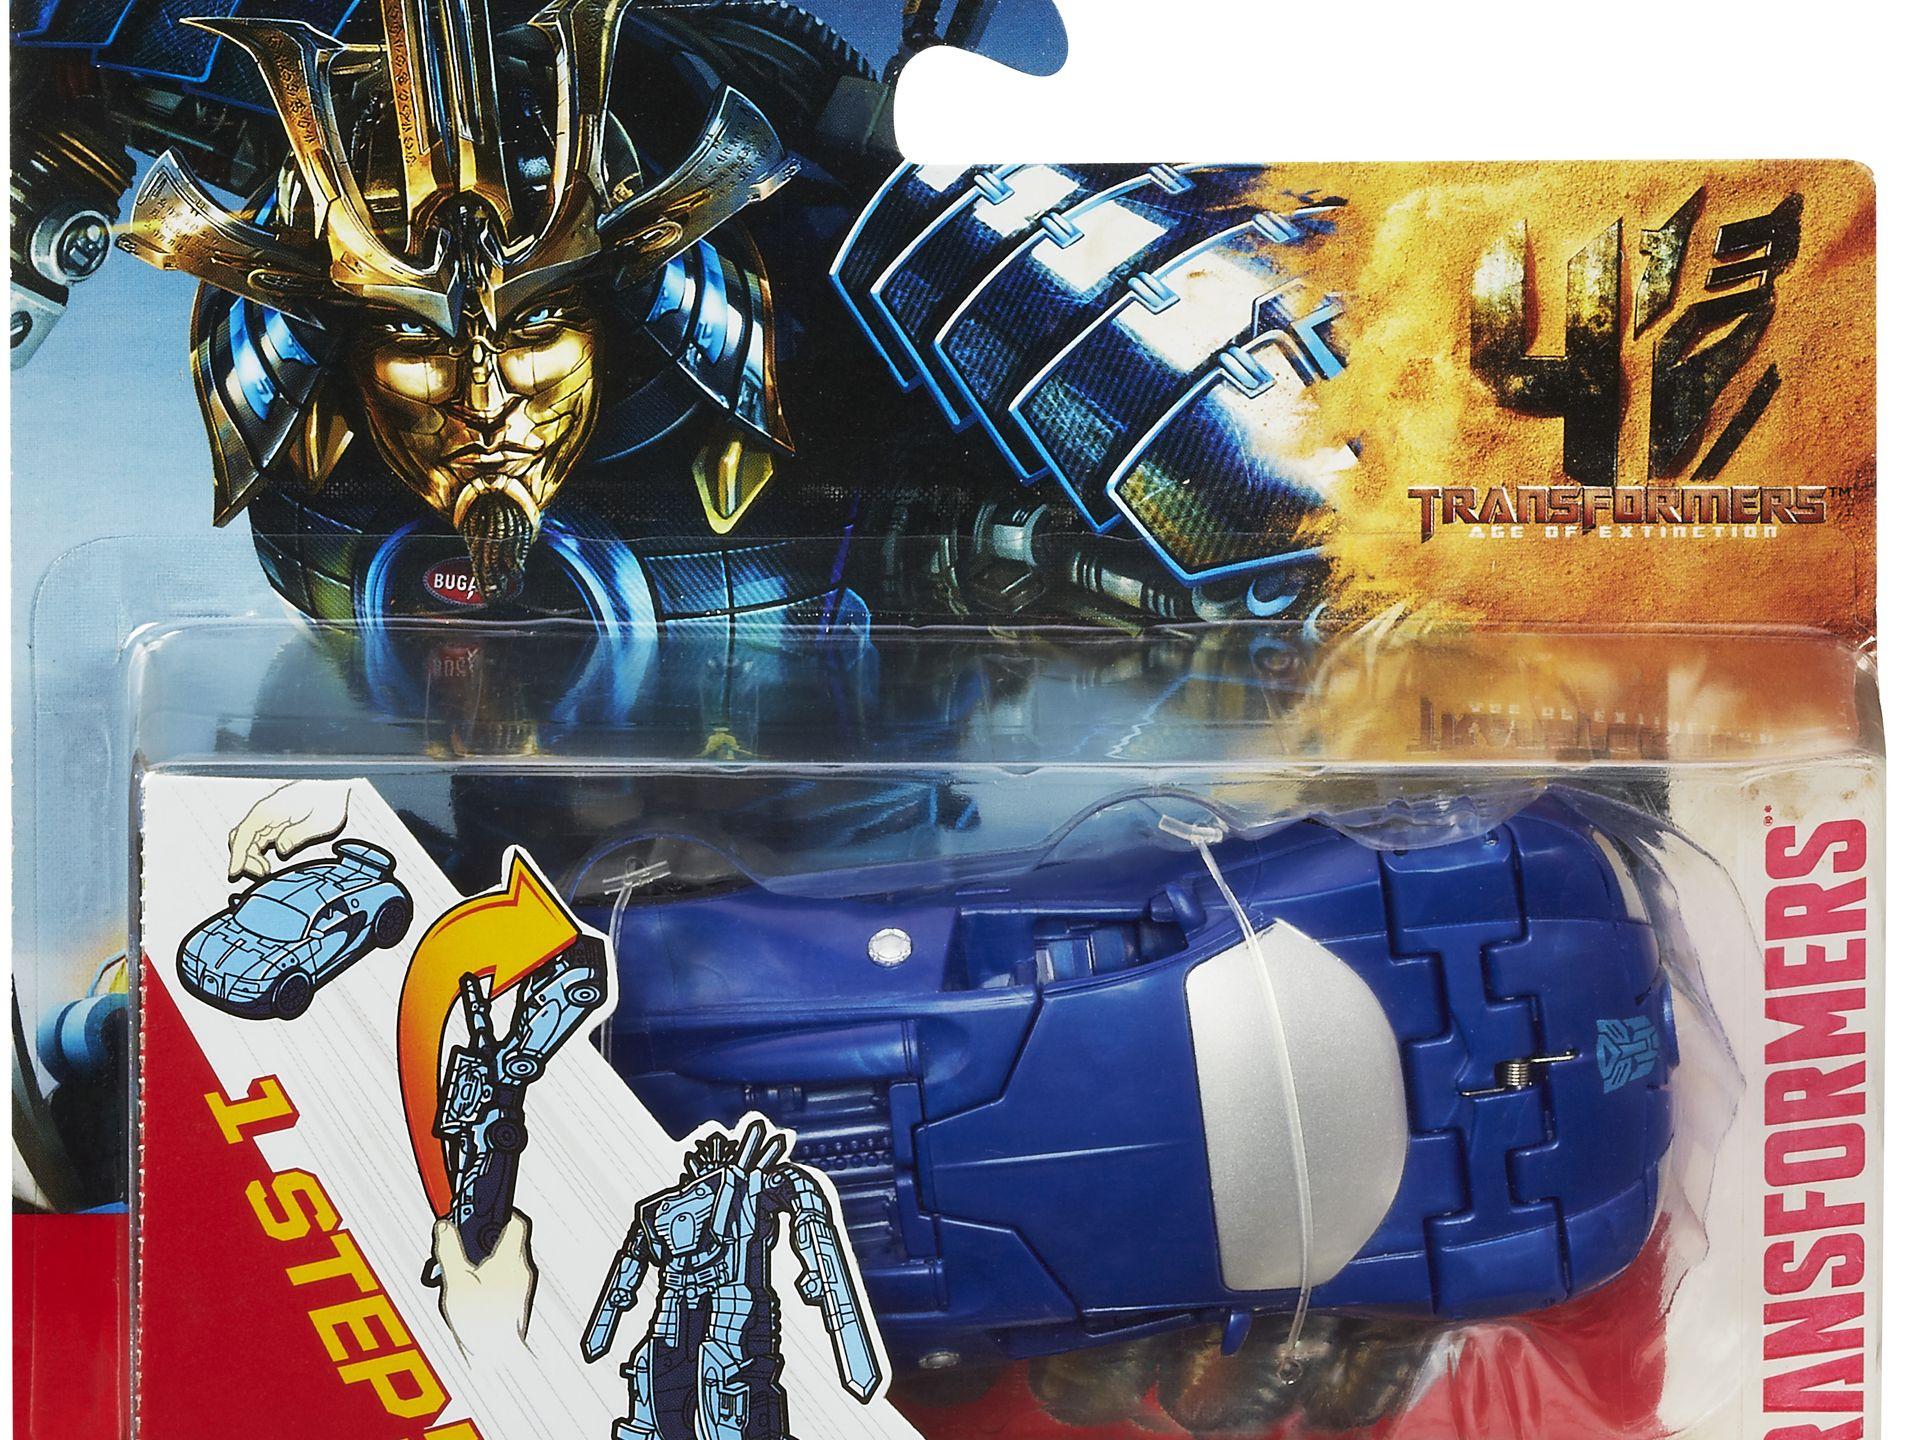 Drift Packaging for Transformers 4 Drift Packaging for Transformers 4